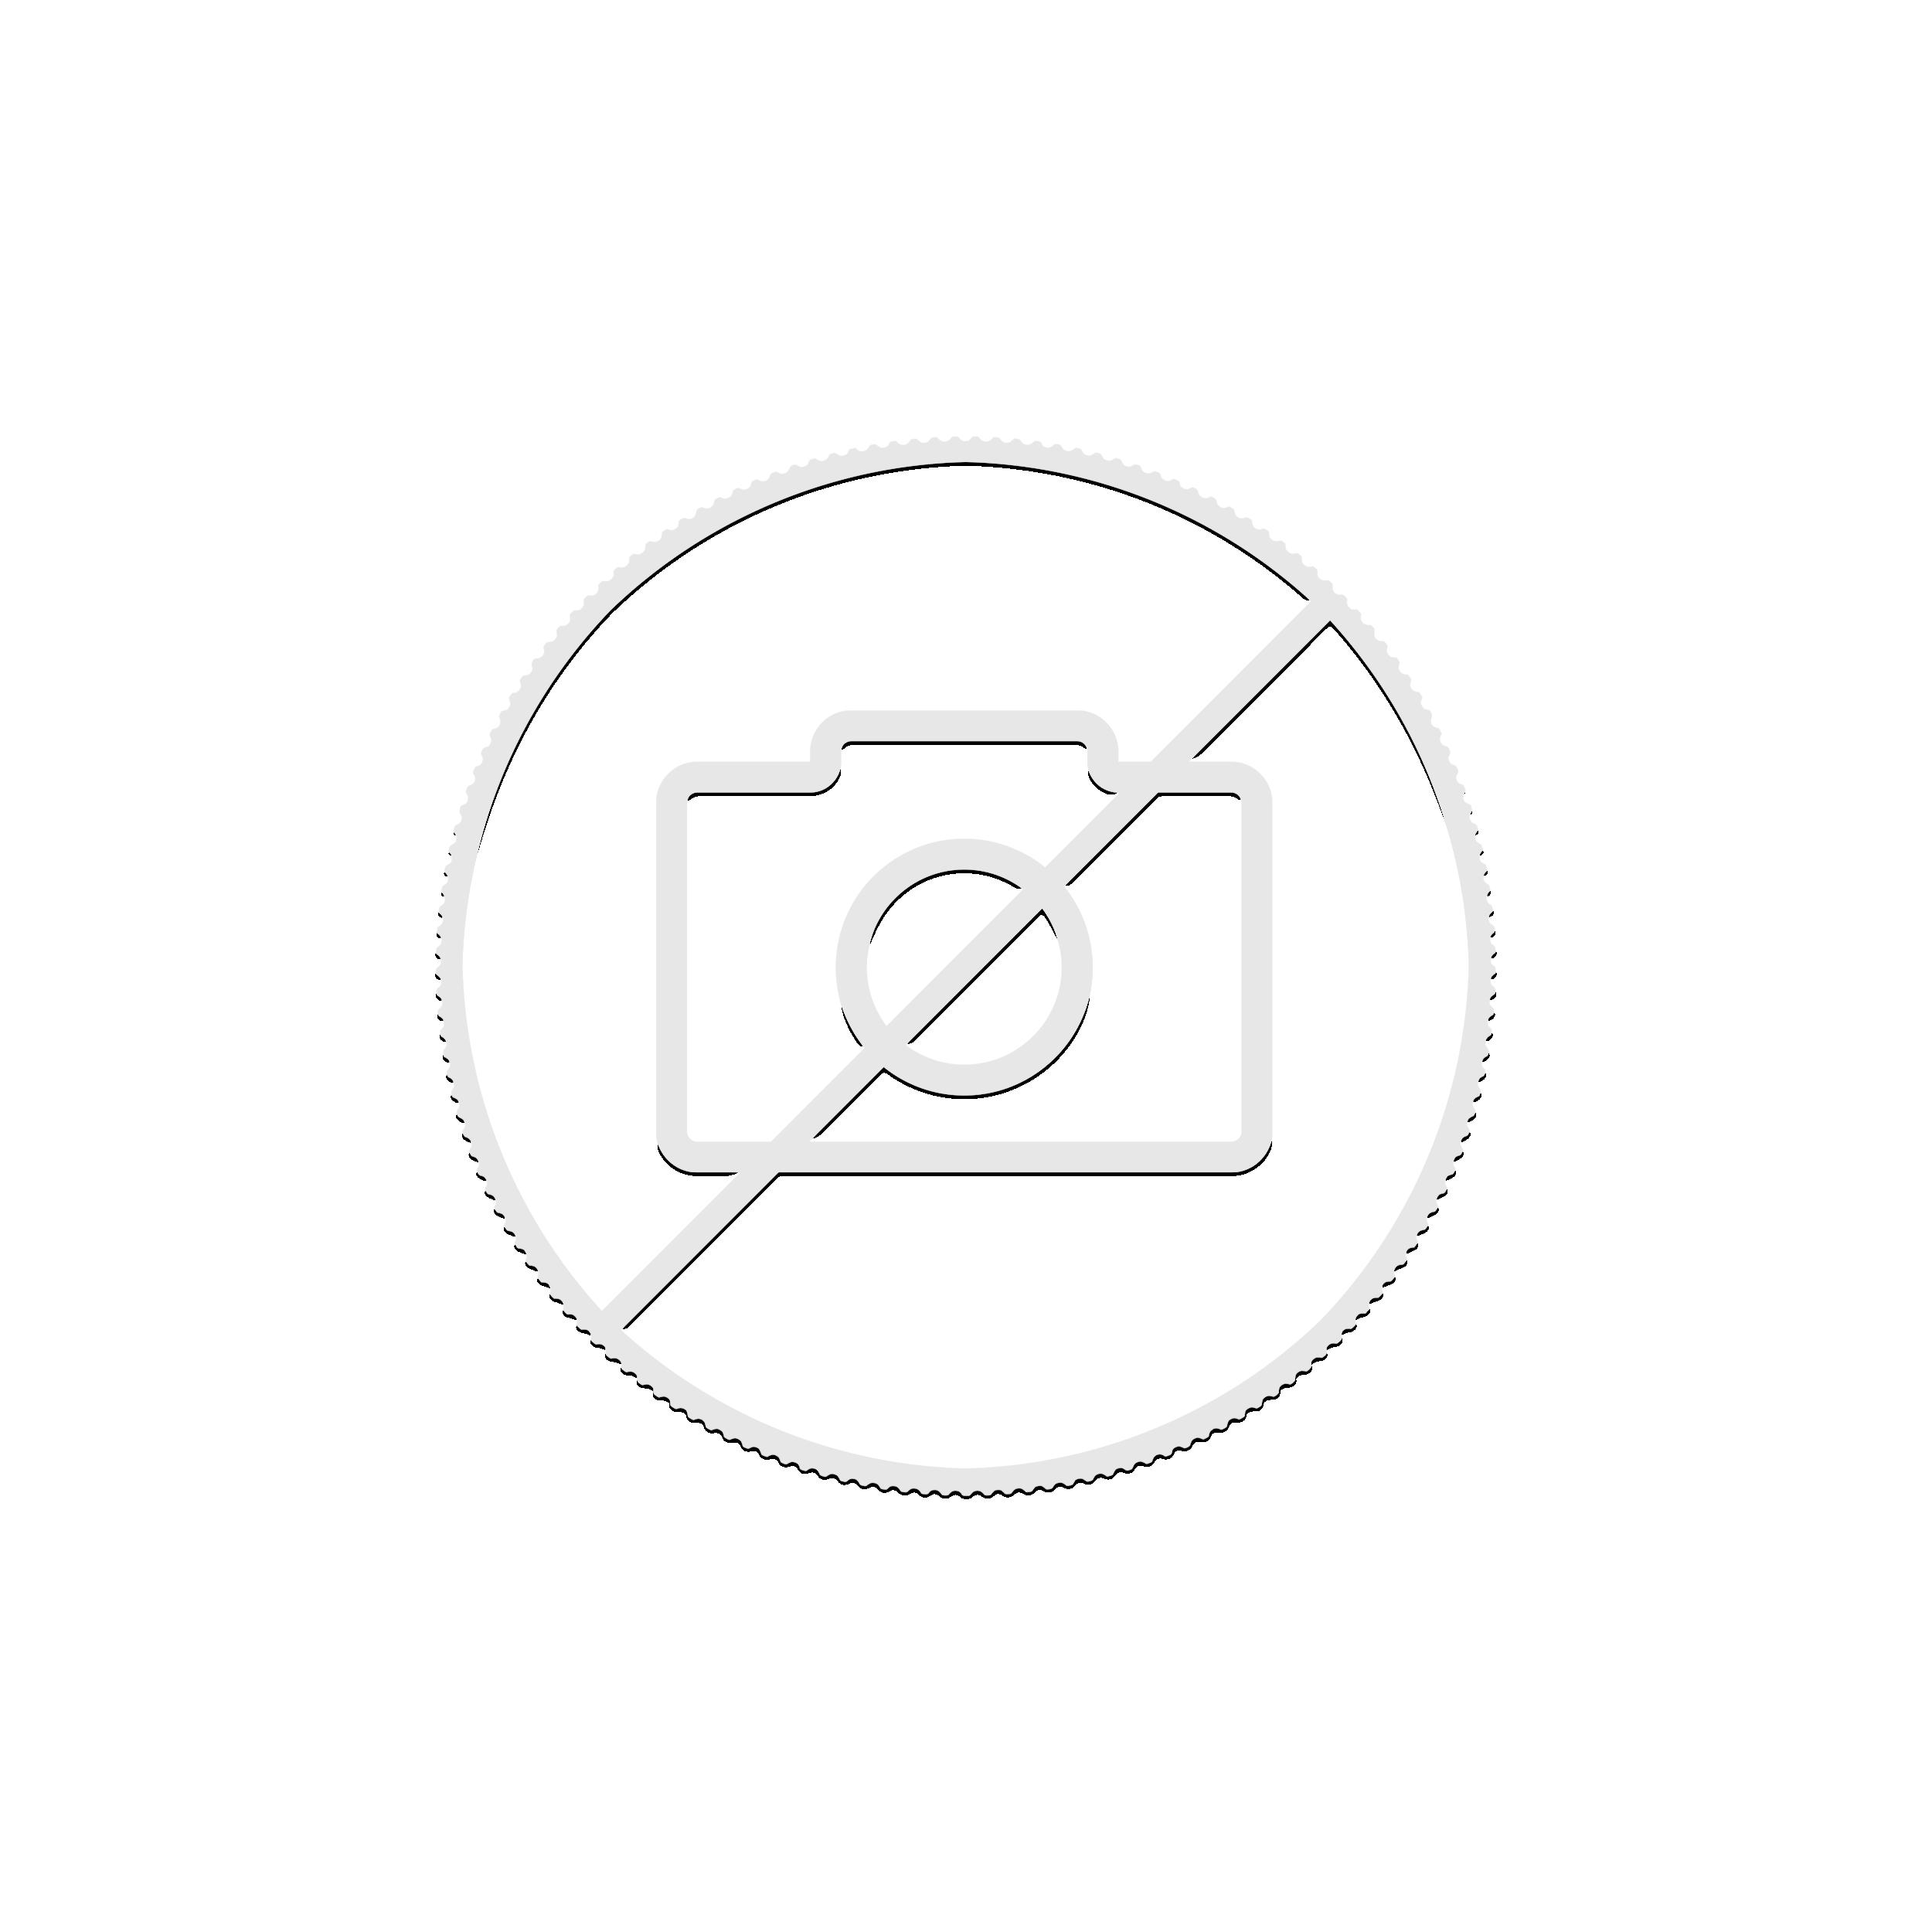 1 troy ounce zilveren munt one love 2021 proof